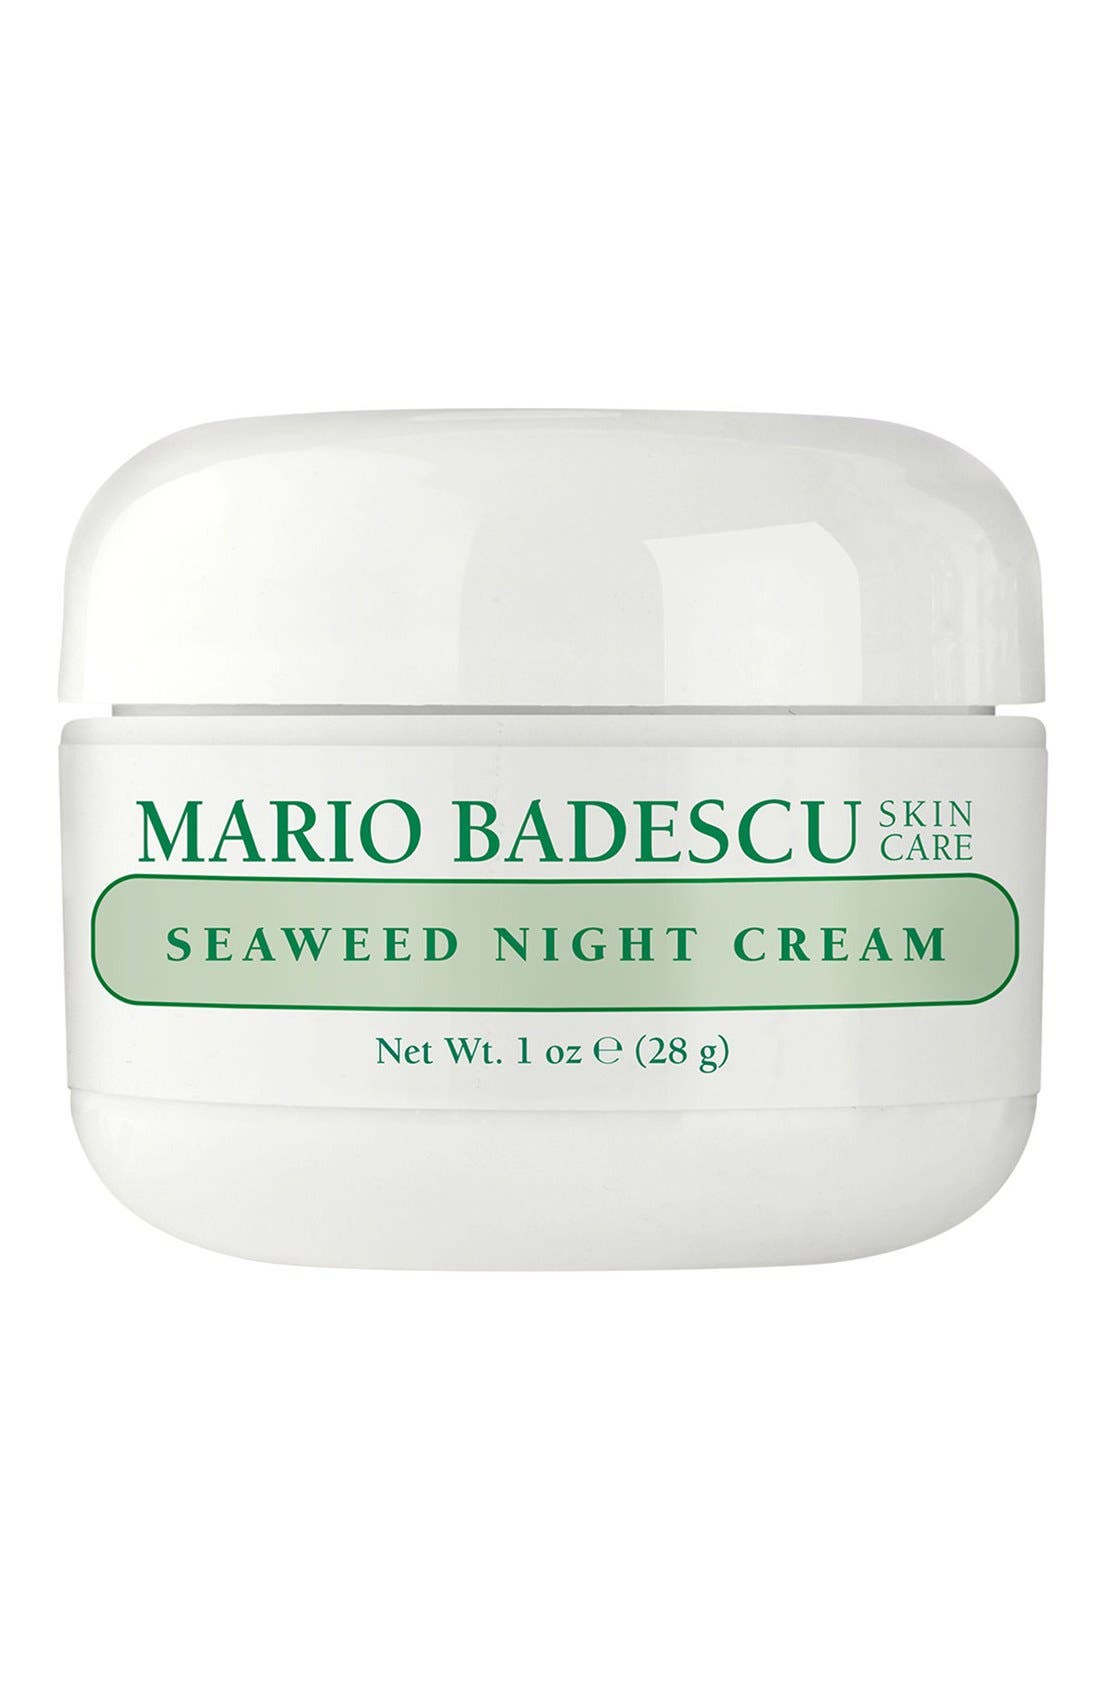 Seaweed Night Cream,                             Main thumbnail 1, color,                             NONE